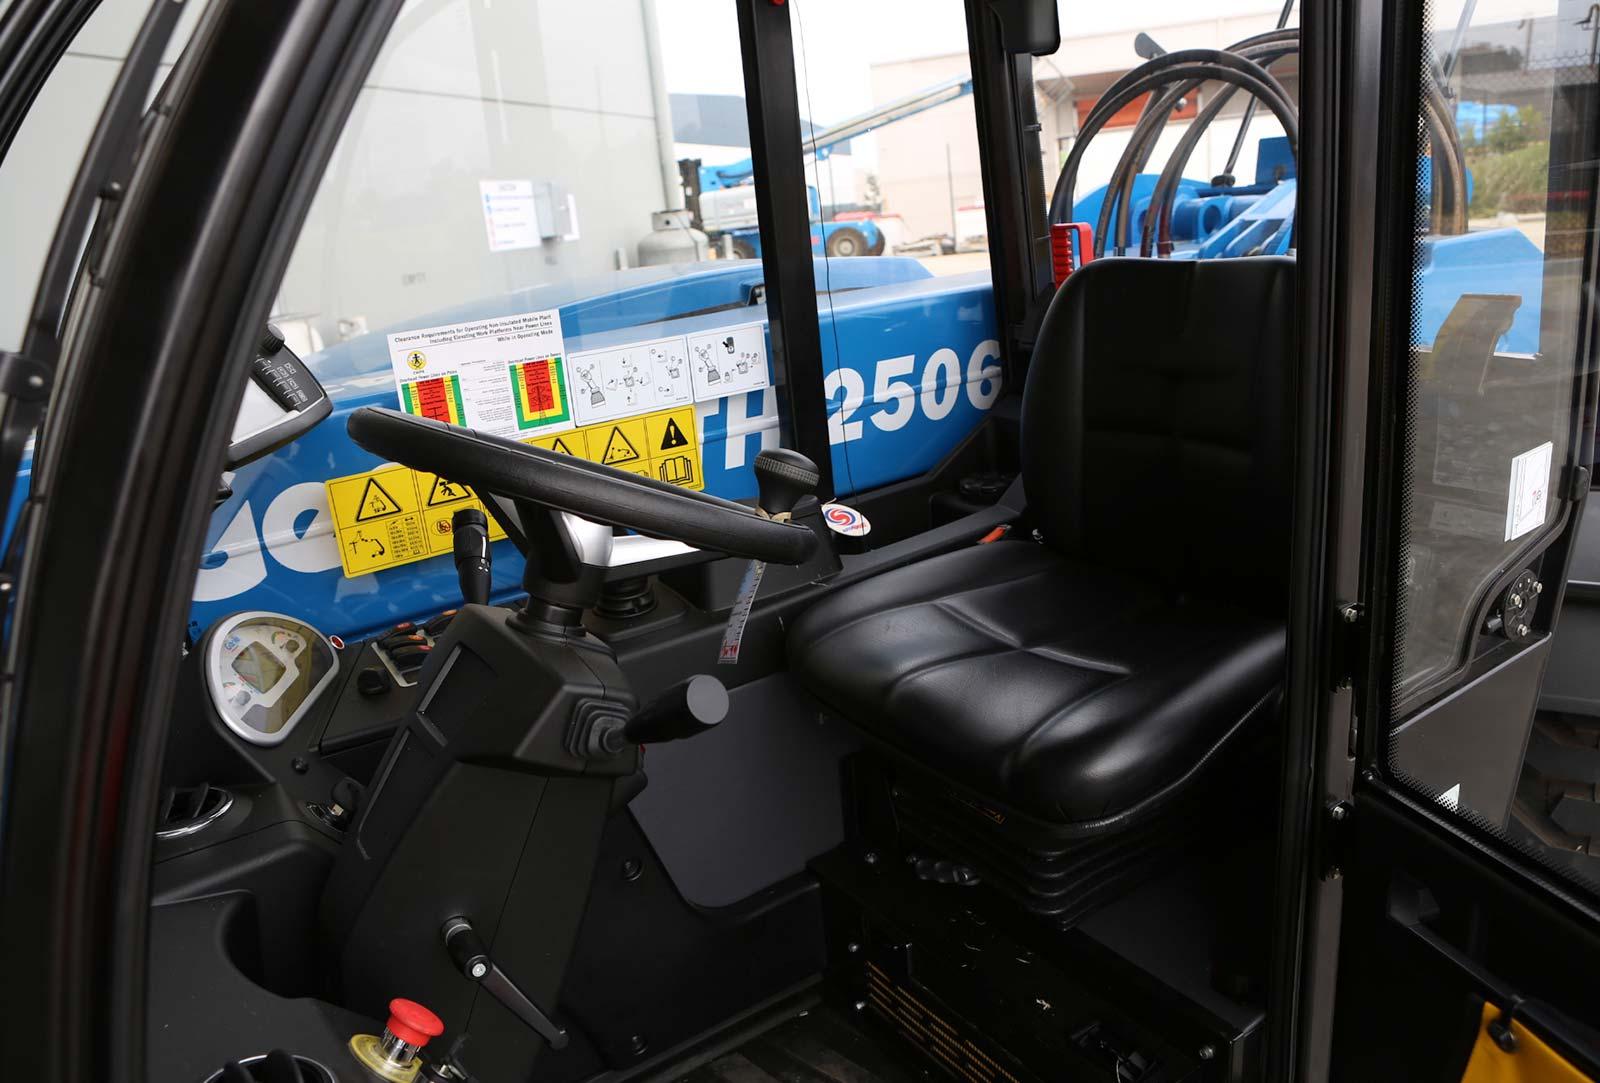 Hire 2.5 Tonne Telehandler Forklift